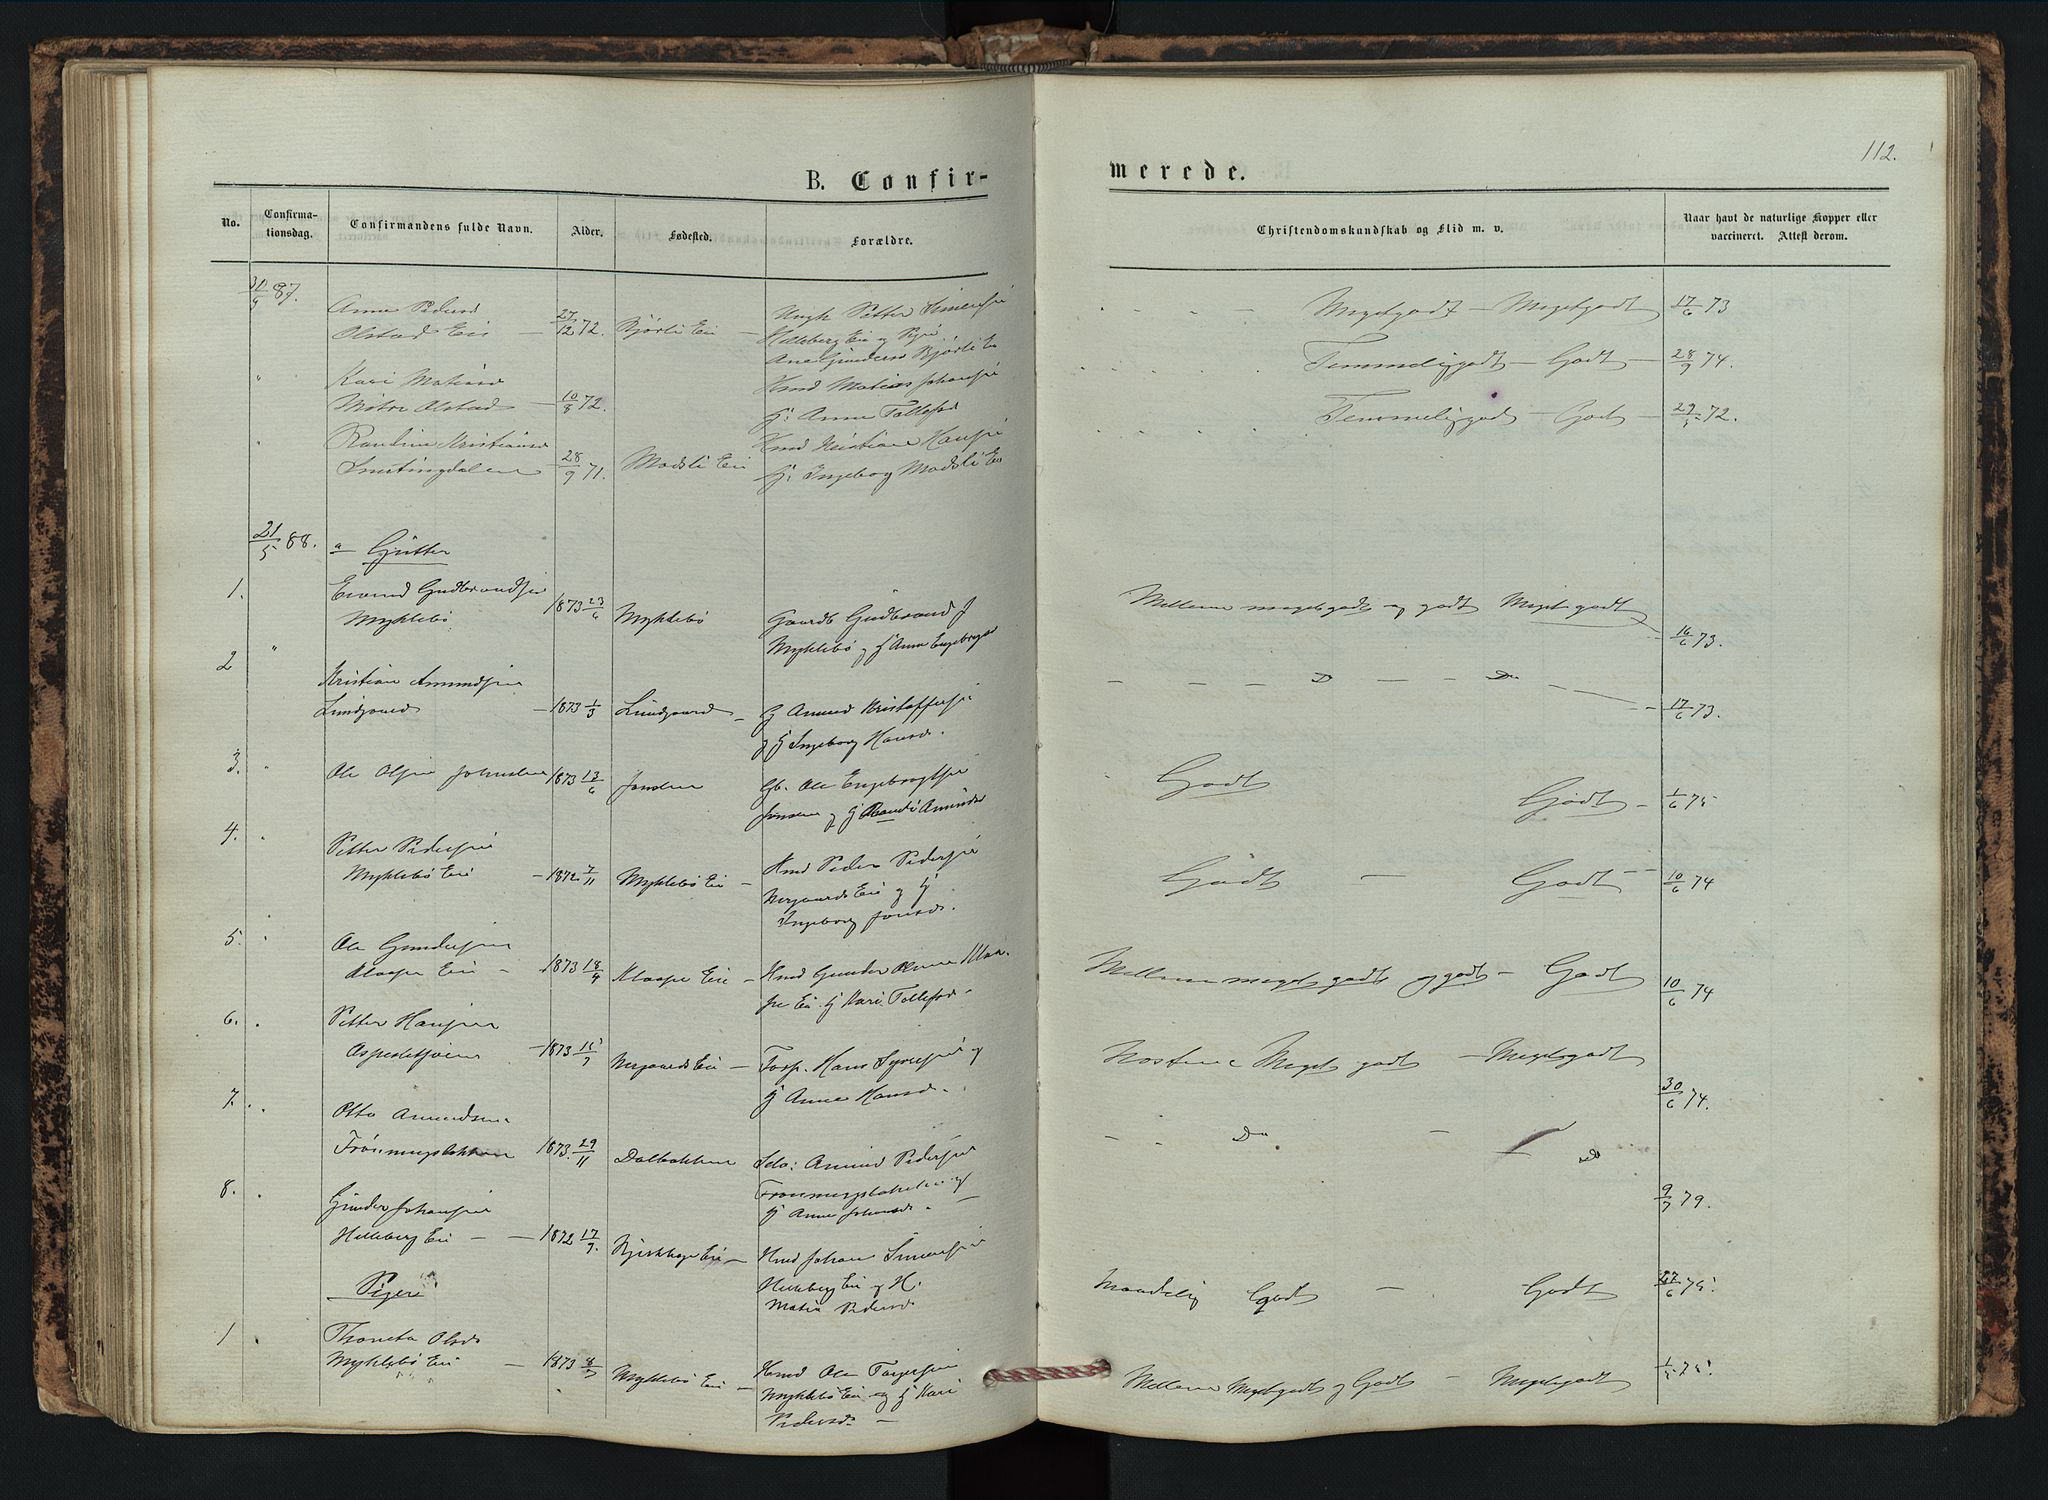 SAH, Vestre Gausdal prestekontor, Klokkerbok nr. 2, 1874-1897, s. 112